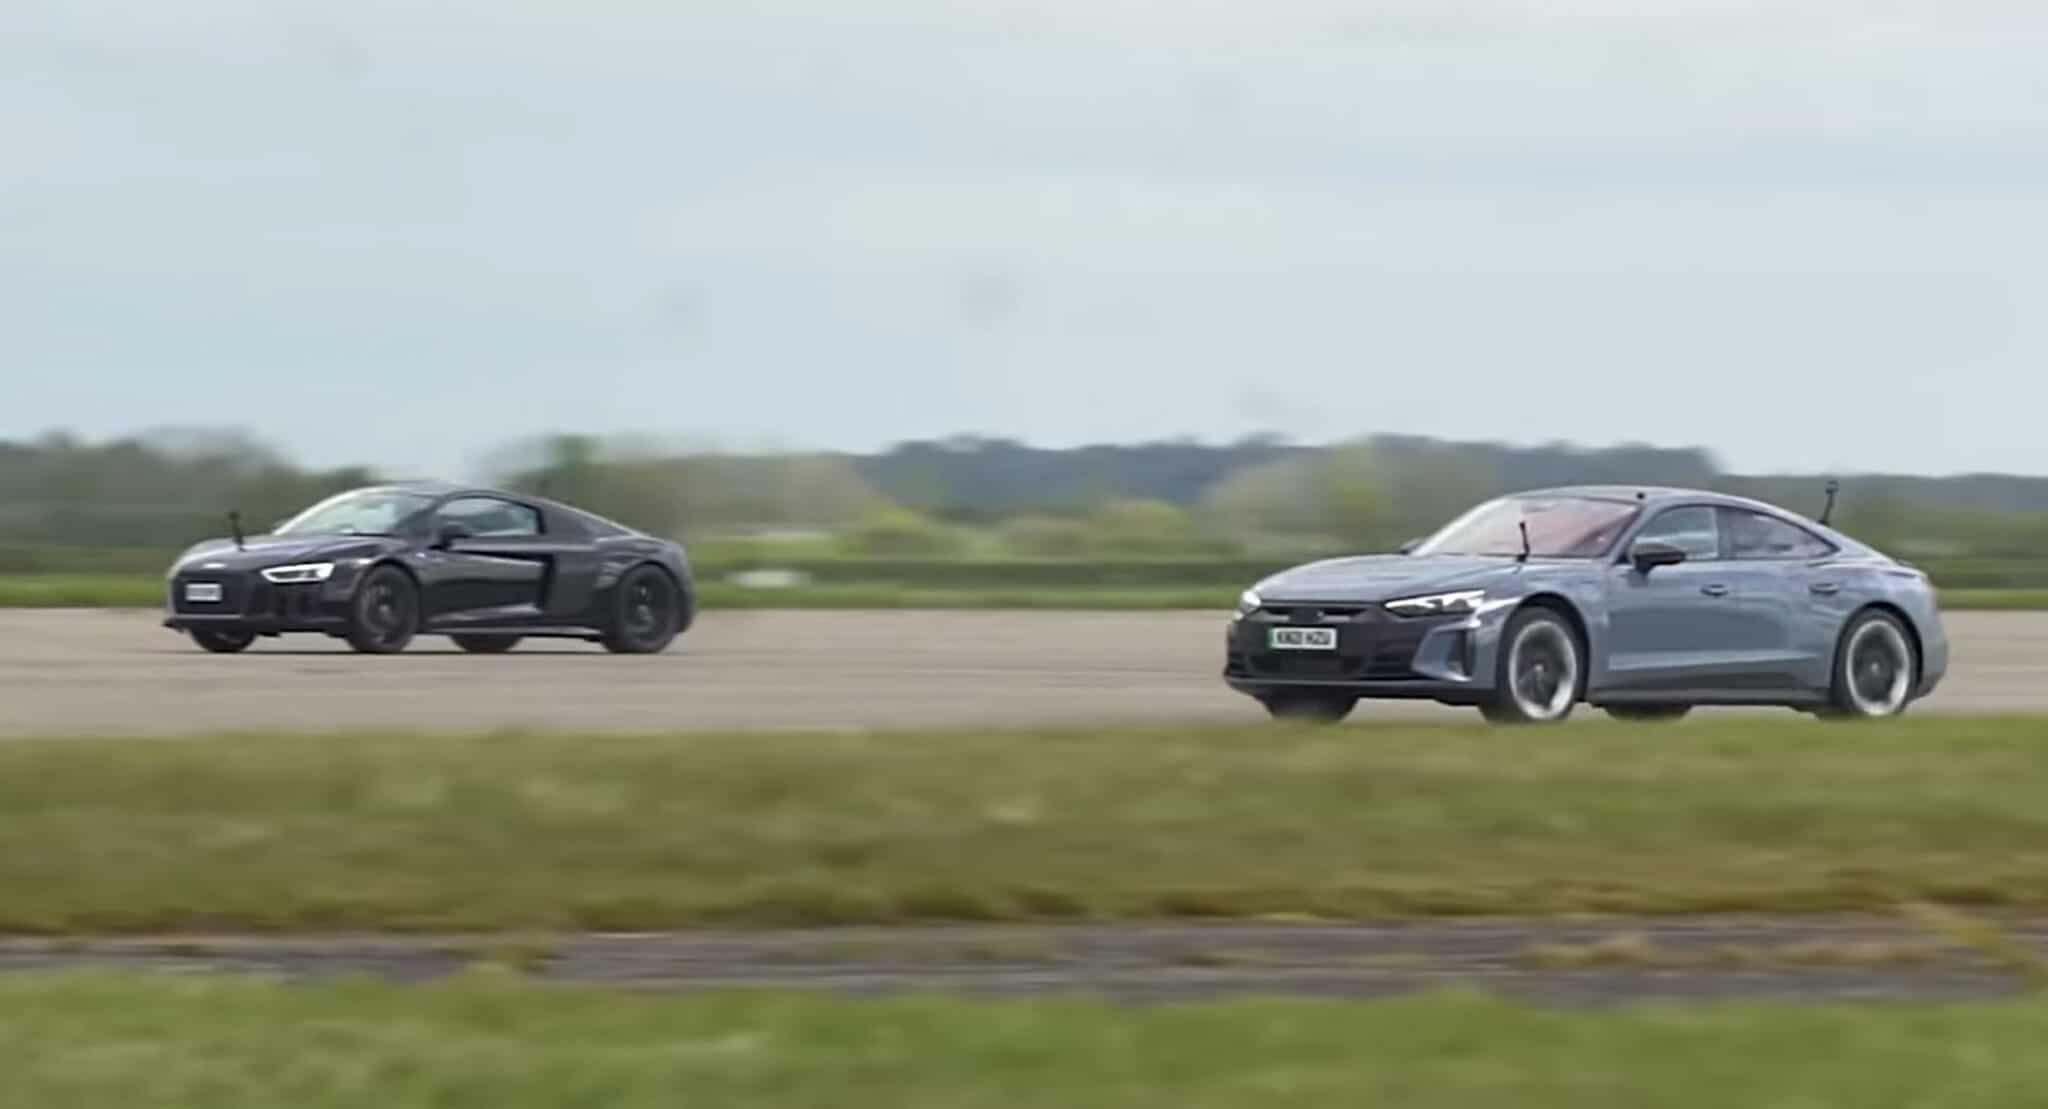 El Audi RS e-tron GT se enfrenta al Audi R8